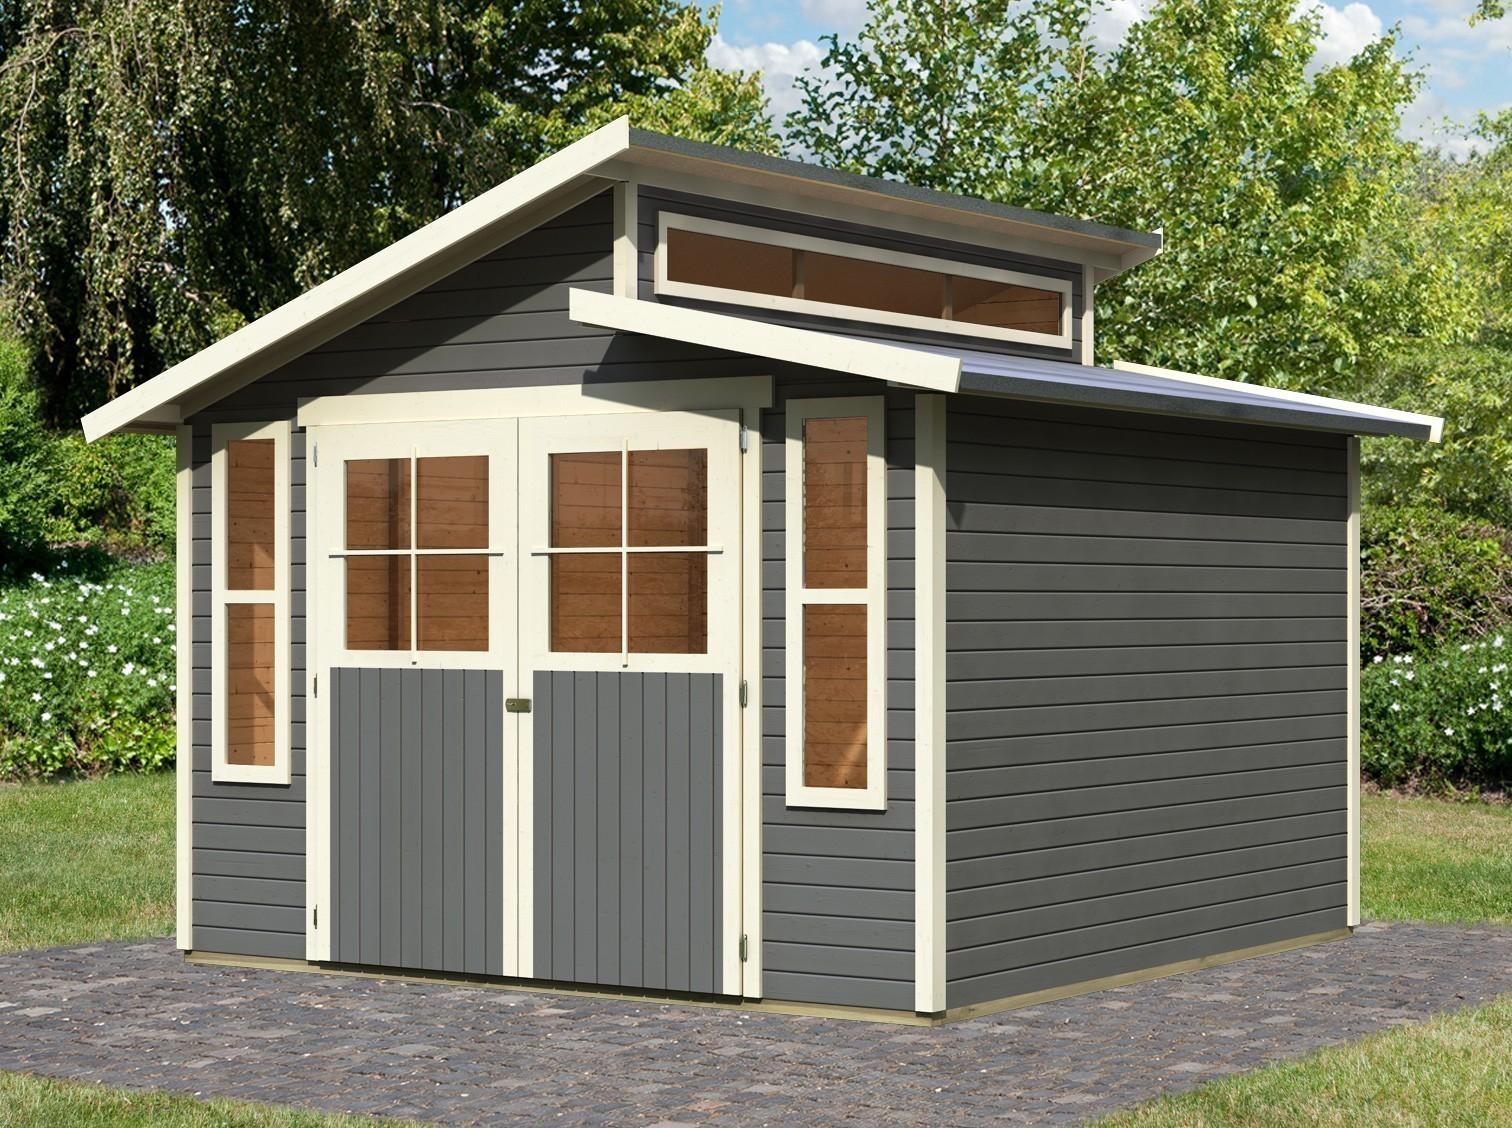 karibu gartenhaus 19 mm grafenau 7 grau 339x354cm bei. Black Bedroom Furniture Sets. Home Design Ideas